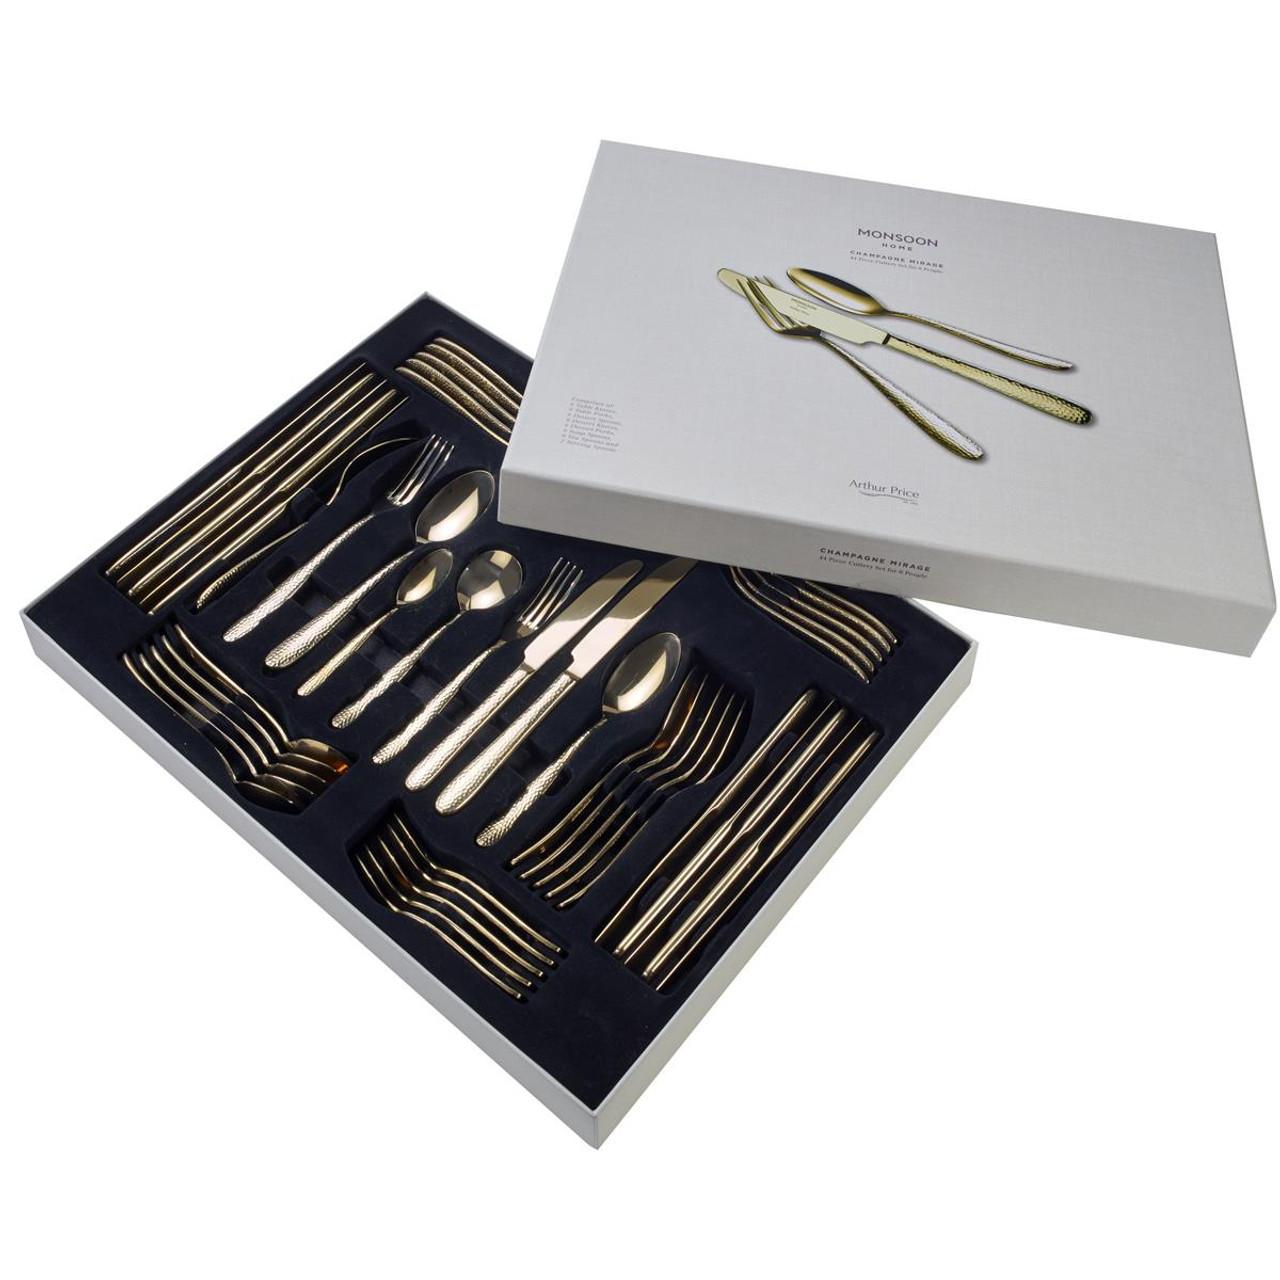 Arthur Price Monsoon Champagne Mirage 44 Piece Cutlery Set